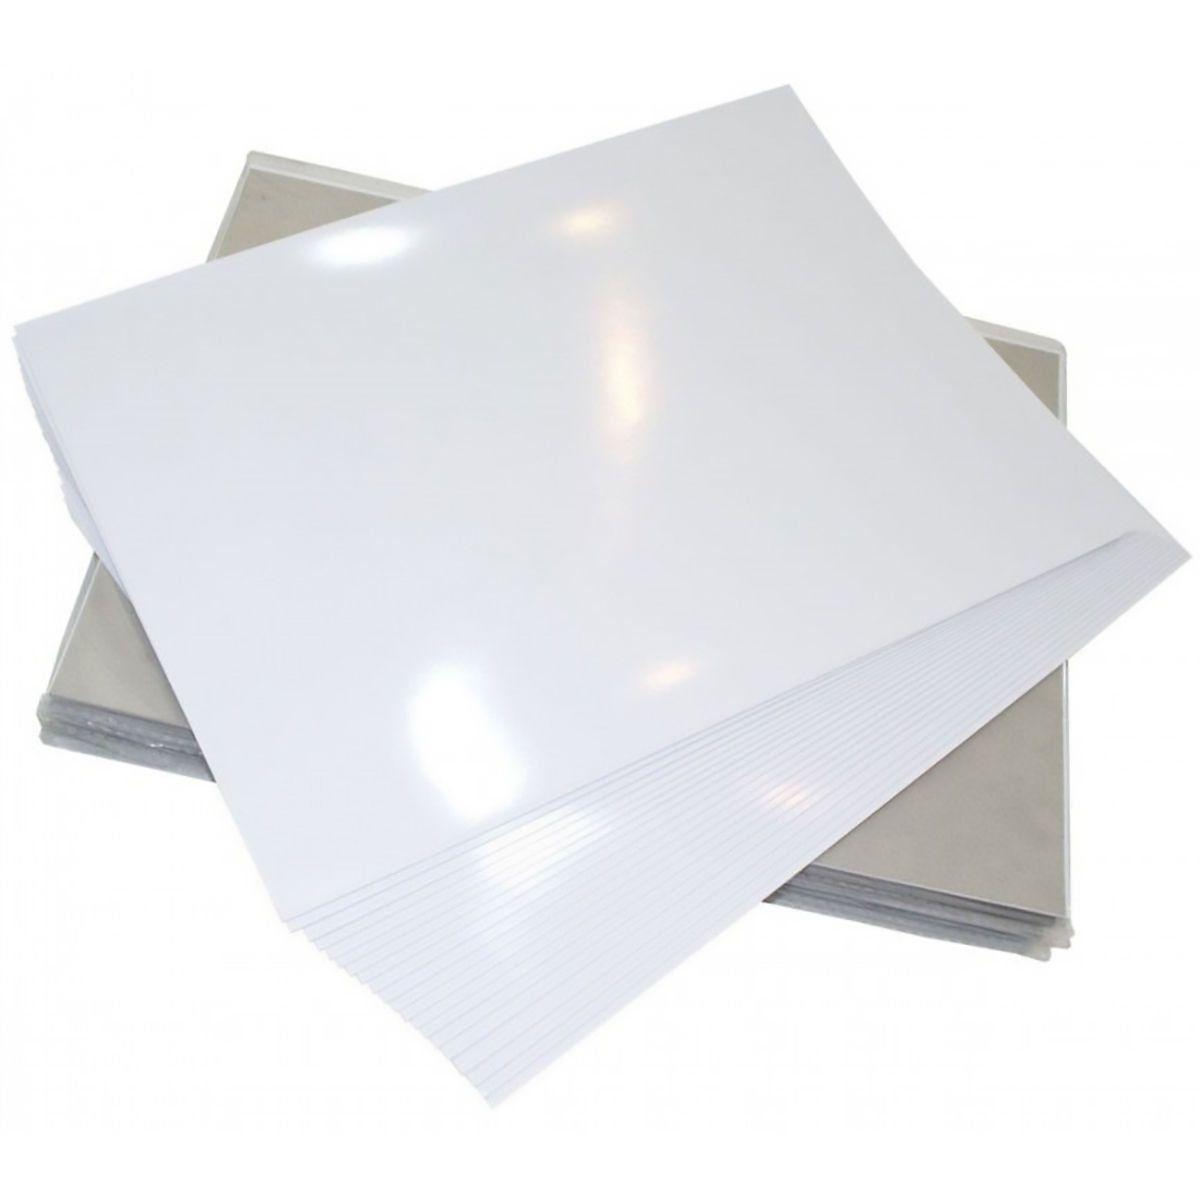 Papel Fotográfico A4 Dupla Face 220g Glossy Branco Brilhante Resistente à Água / 200 folhas